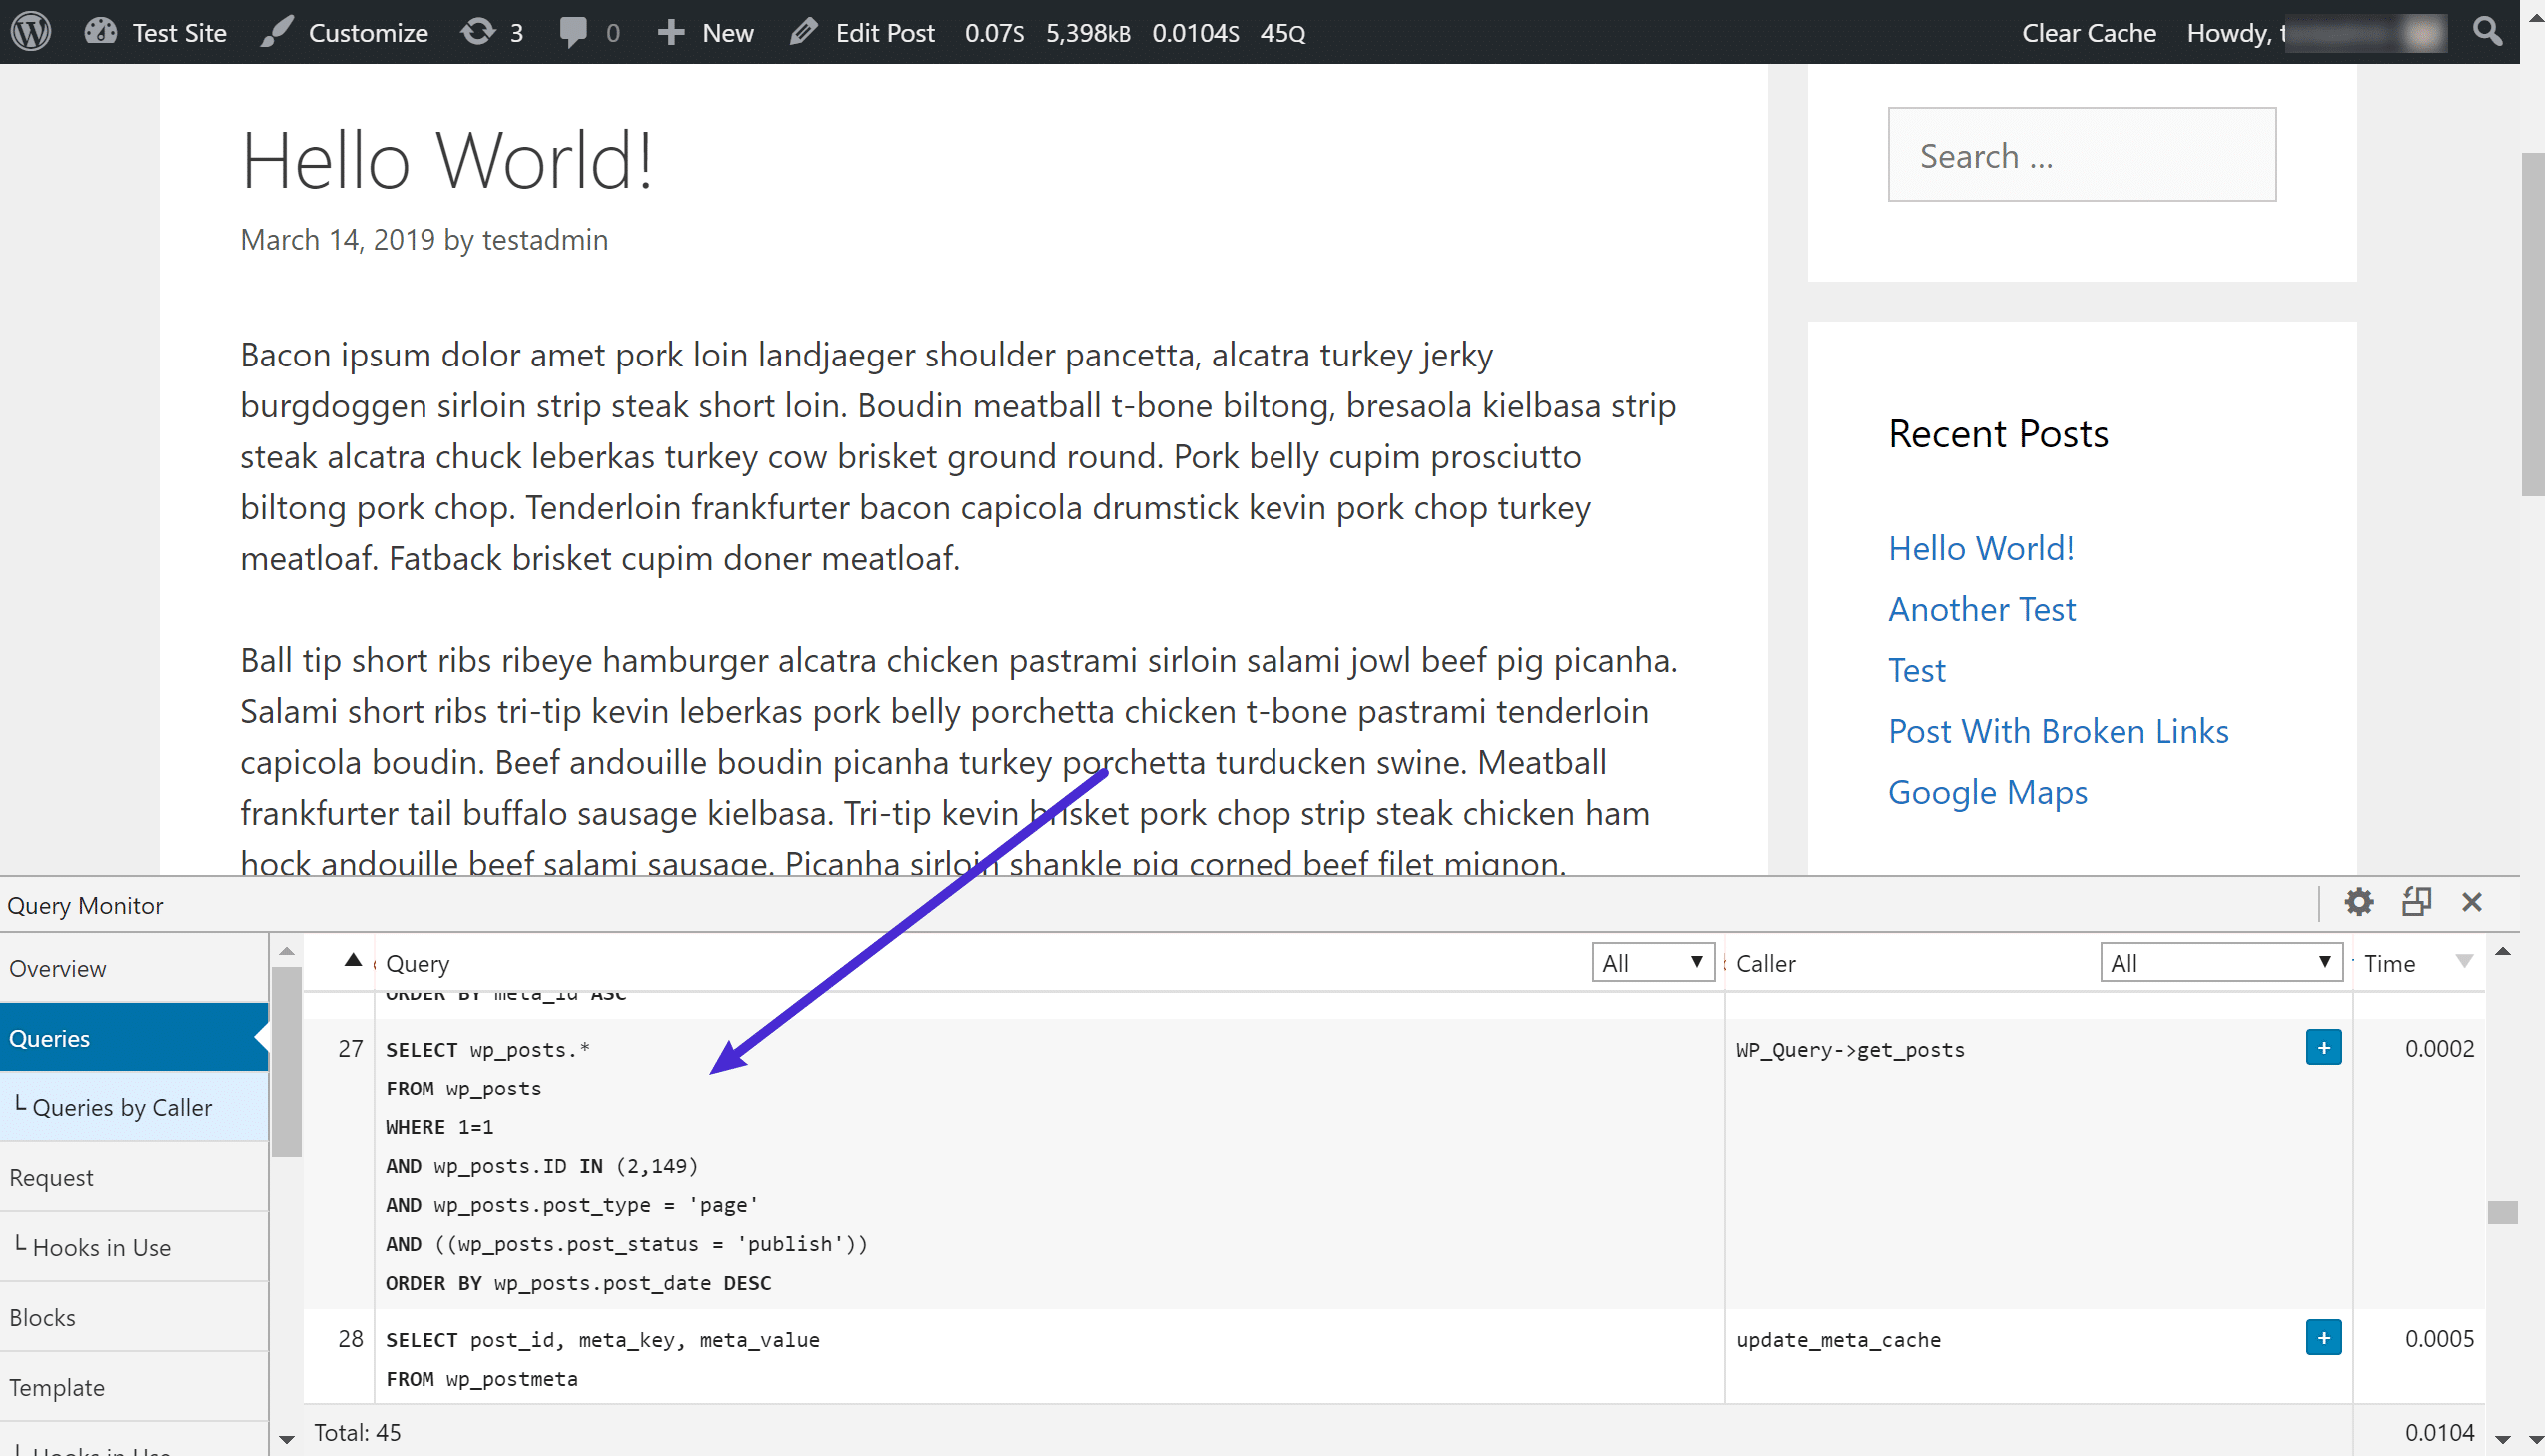 El plugin de Query Monitor muestra sus queries individuales de SQL enviados al servidor MySQL